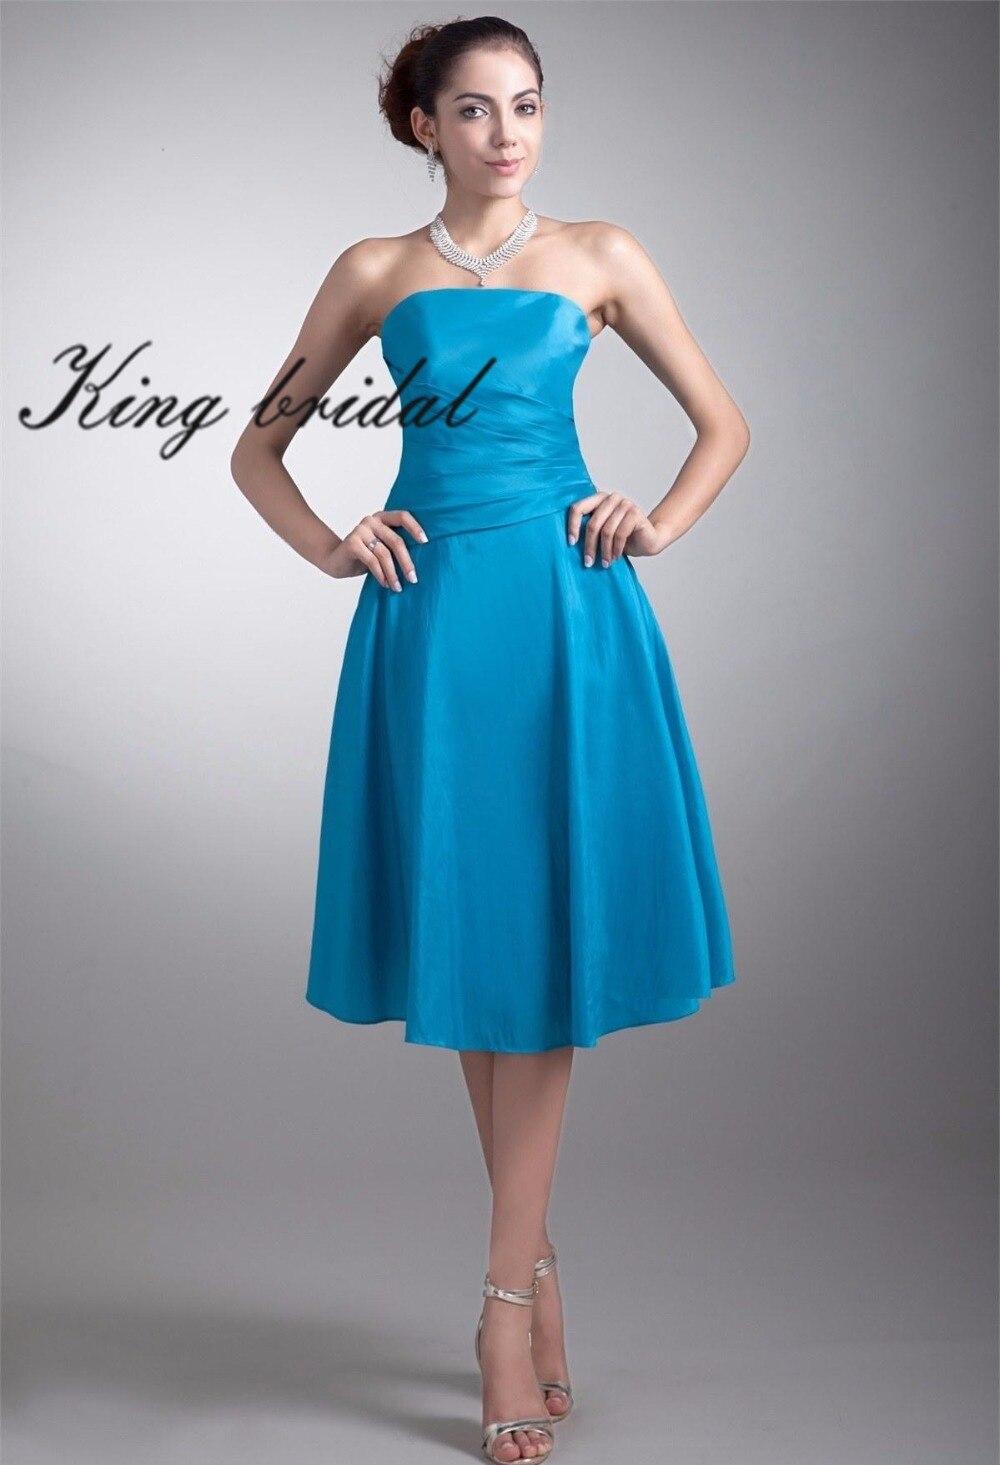 Magnificent Goth Bridesmaid Dresses Model - Womens Dresses & Gowns ...